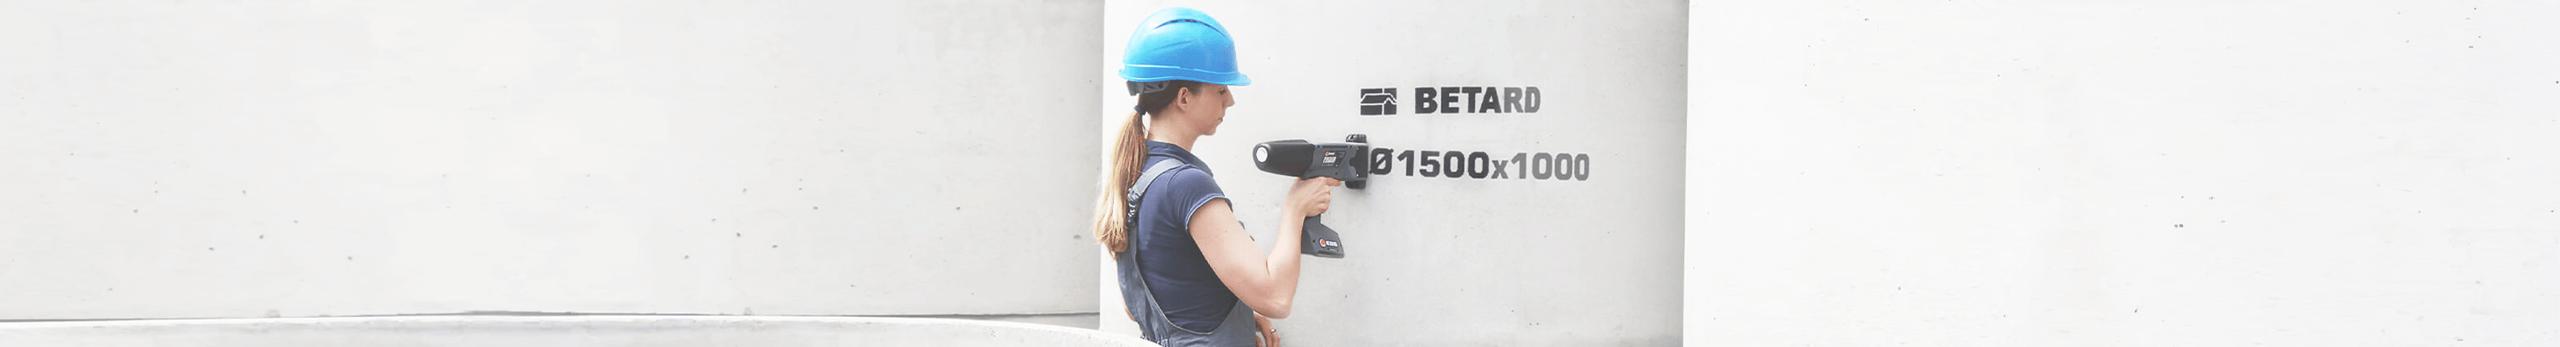 2-rolkowy stabilizator EBS-250 - P511311 - probn stabilizator